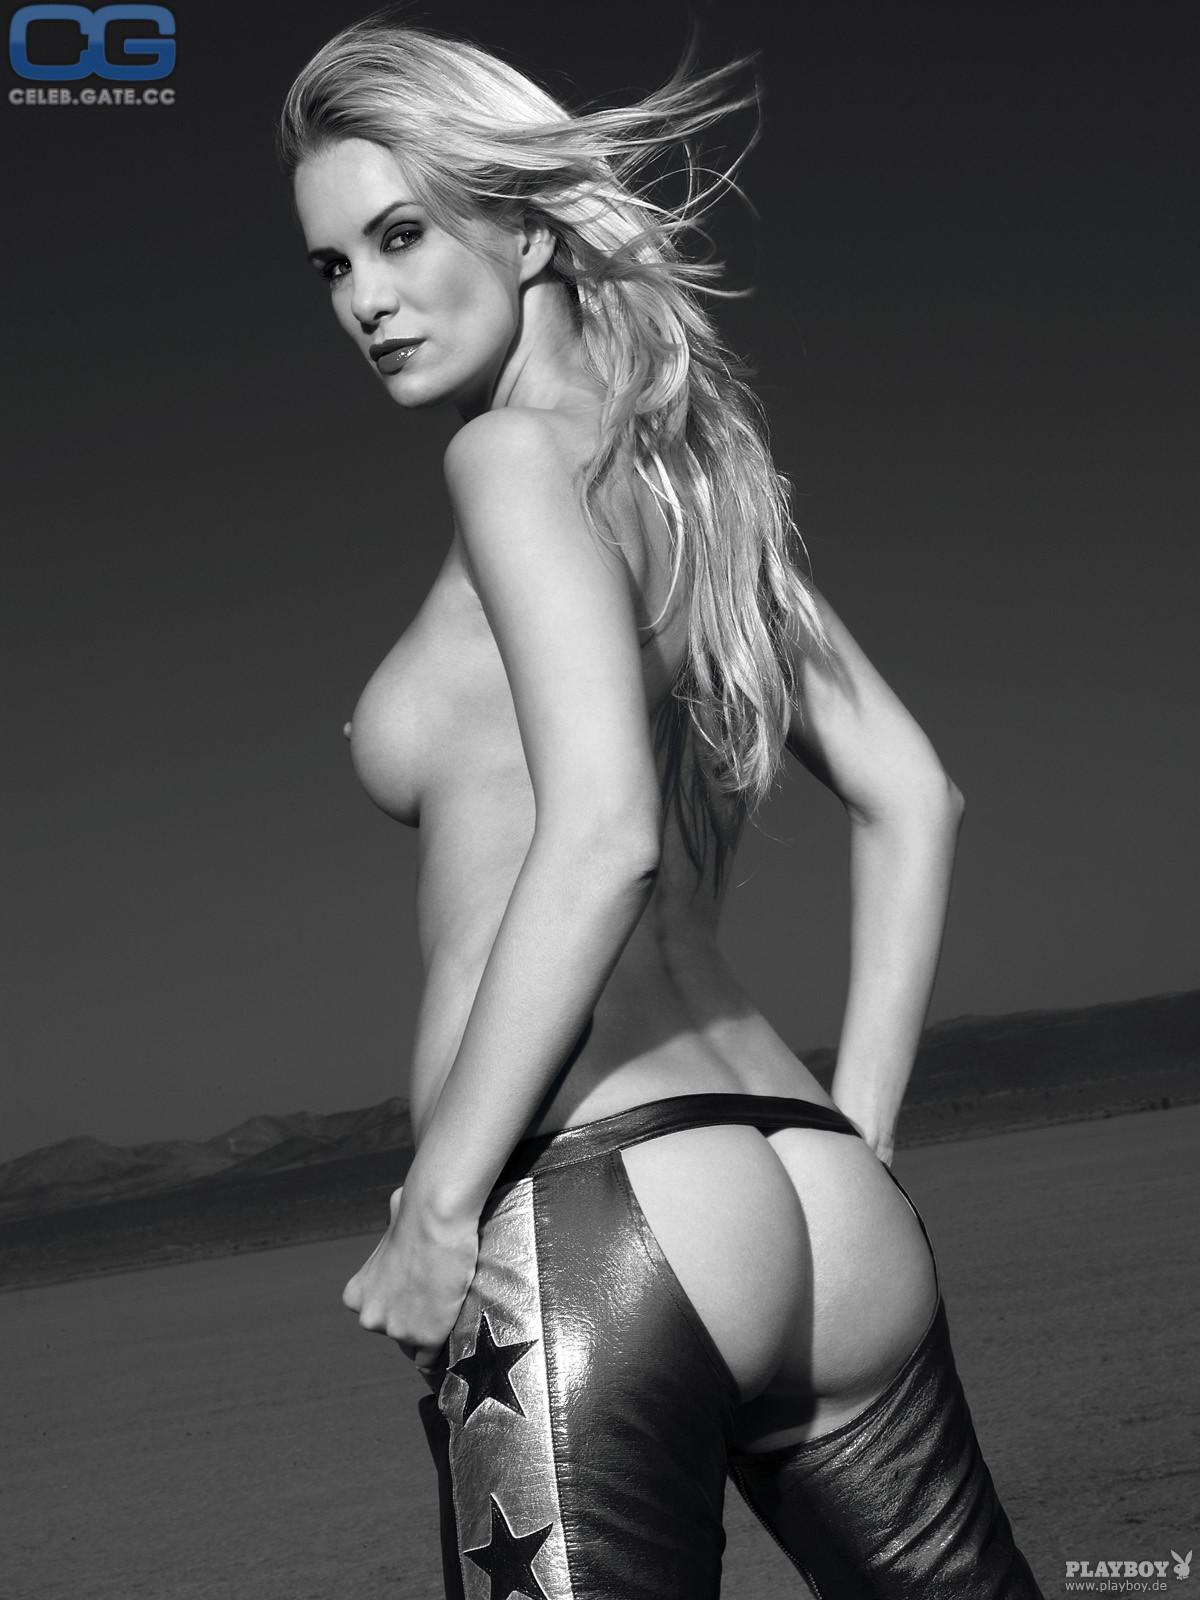 Warm Monica Seles Naked Photos